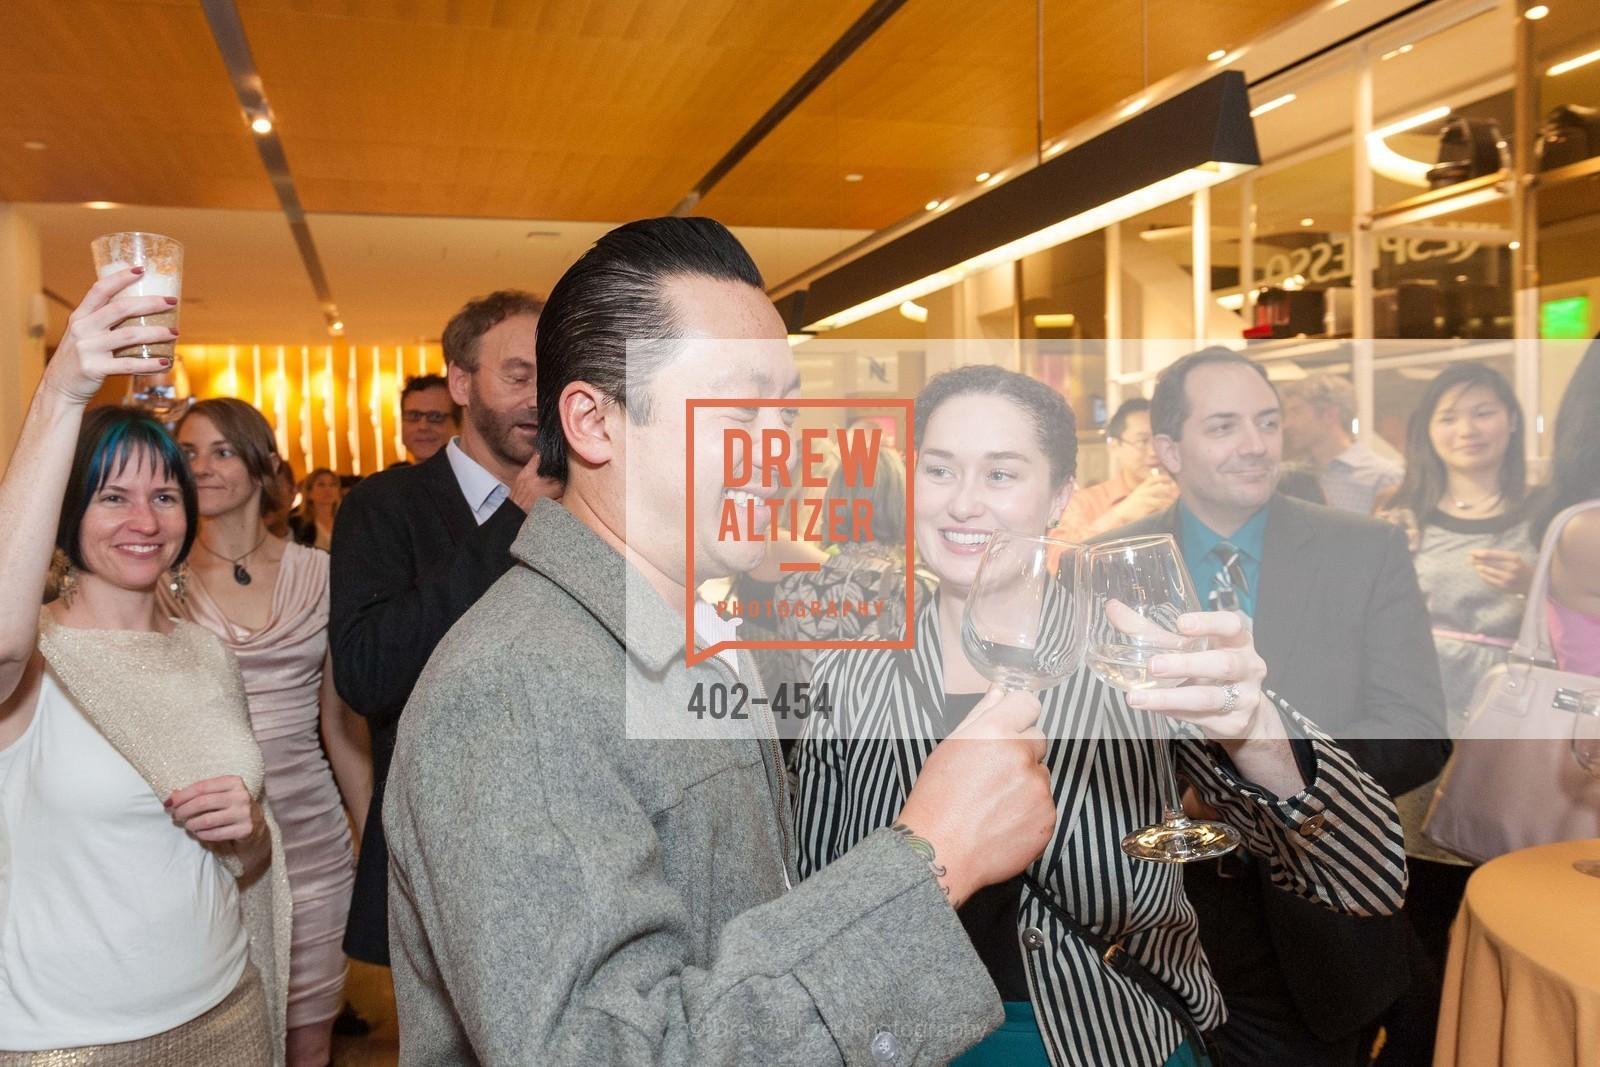 Mike Nguyen, Bridget Dixon, 2014 SAN FRANCISCO BALLET ENCORE! Kick-Off Party, US. Nespresso Boutique Bar, 90 Grant Avenue, January 7th, 2014,Drew Altizer, Drew Altizer Photography, full-service agency, private events, San Francisco photographer, photographer california